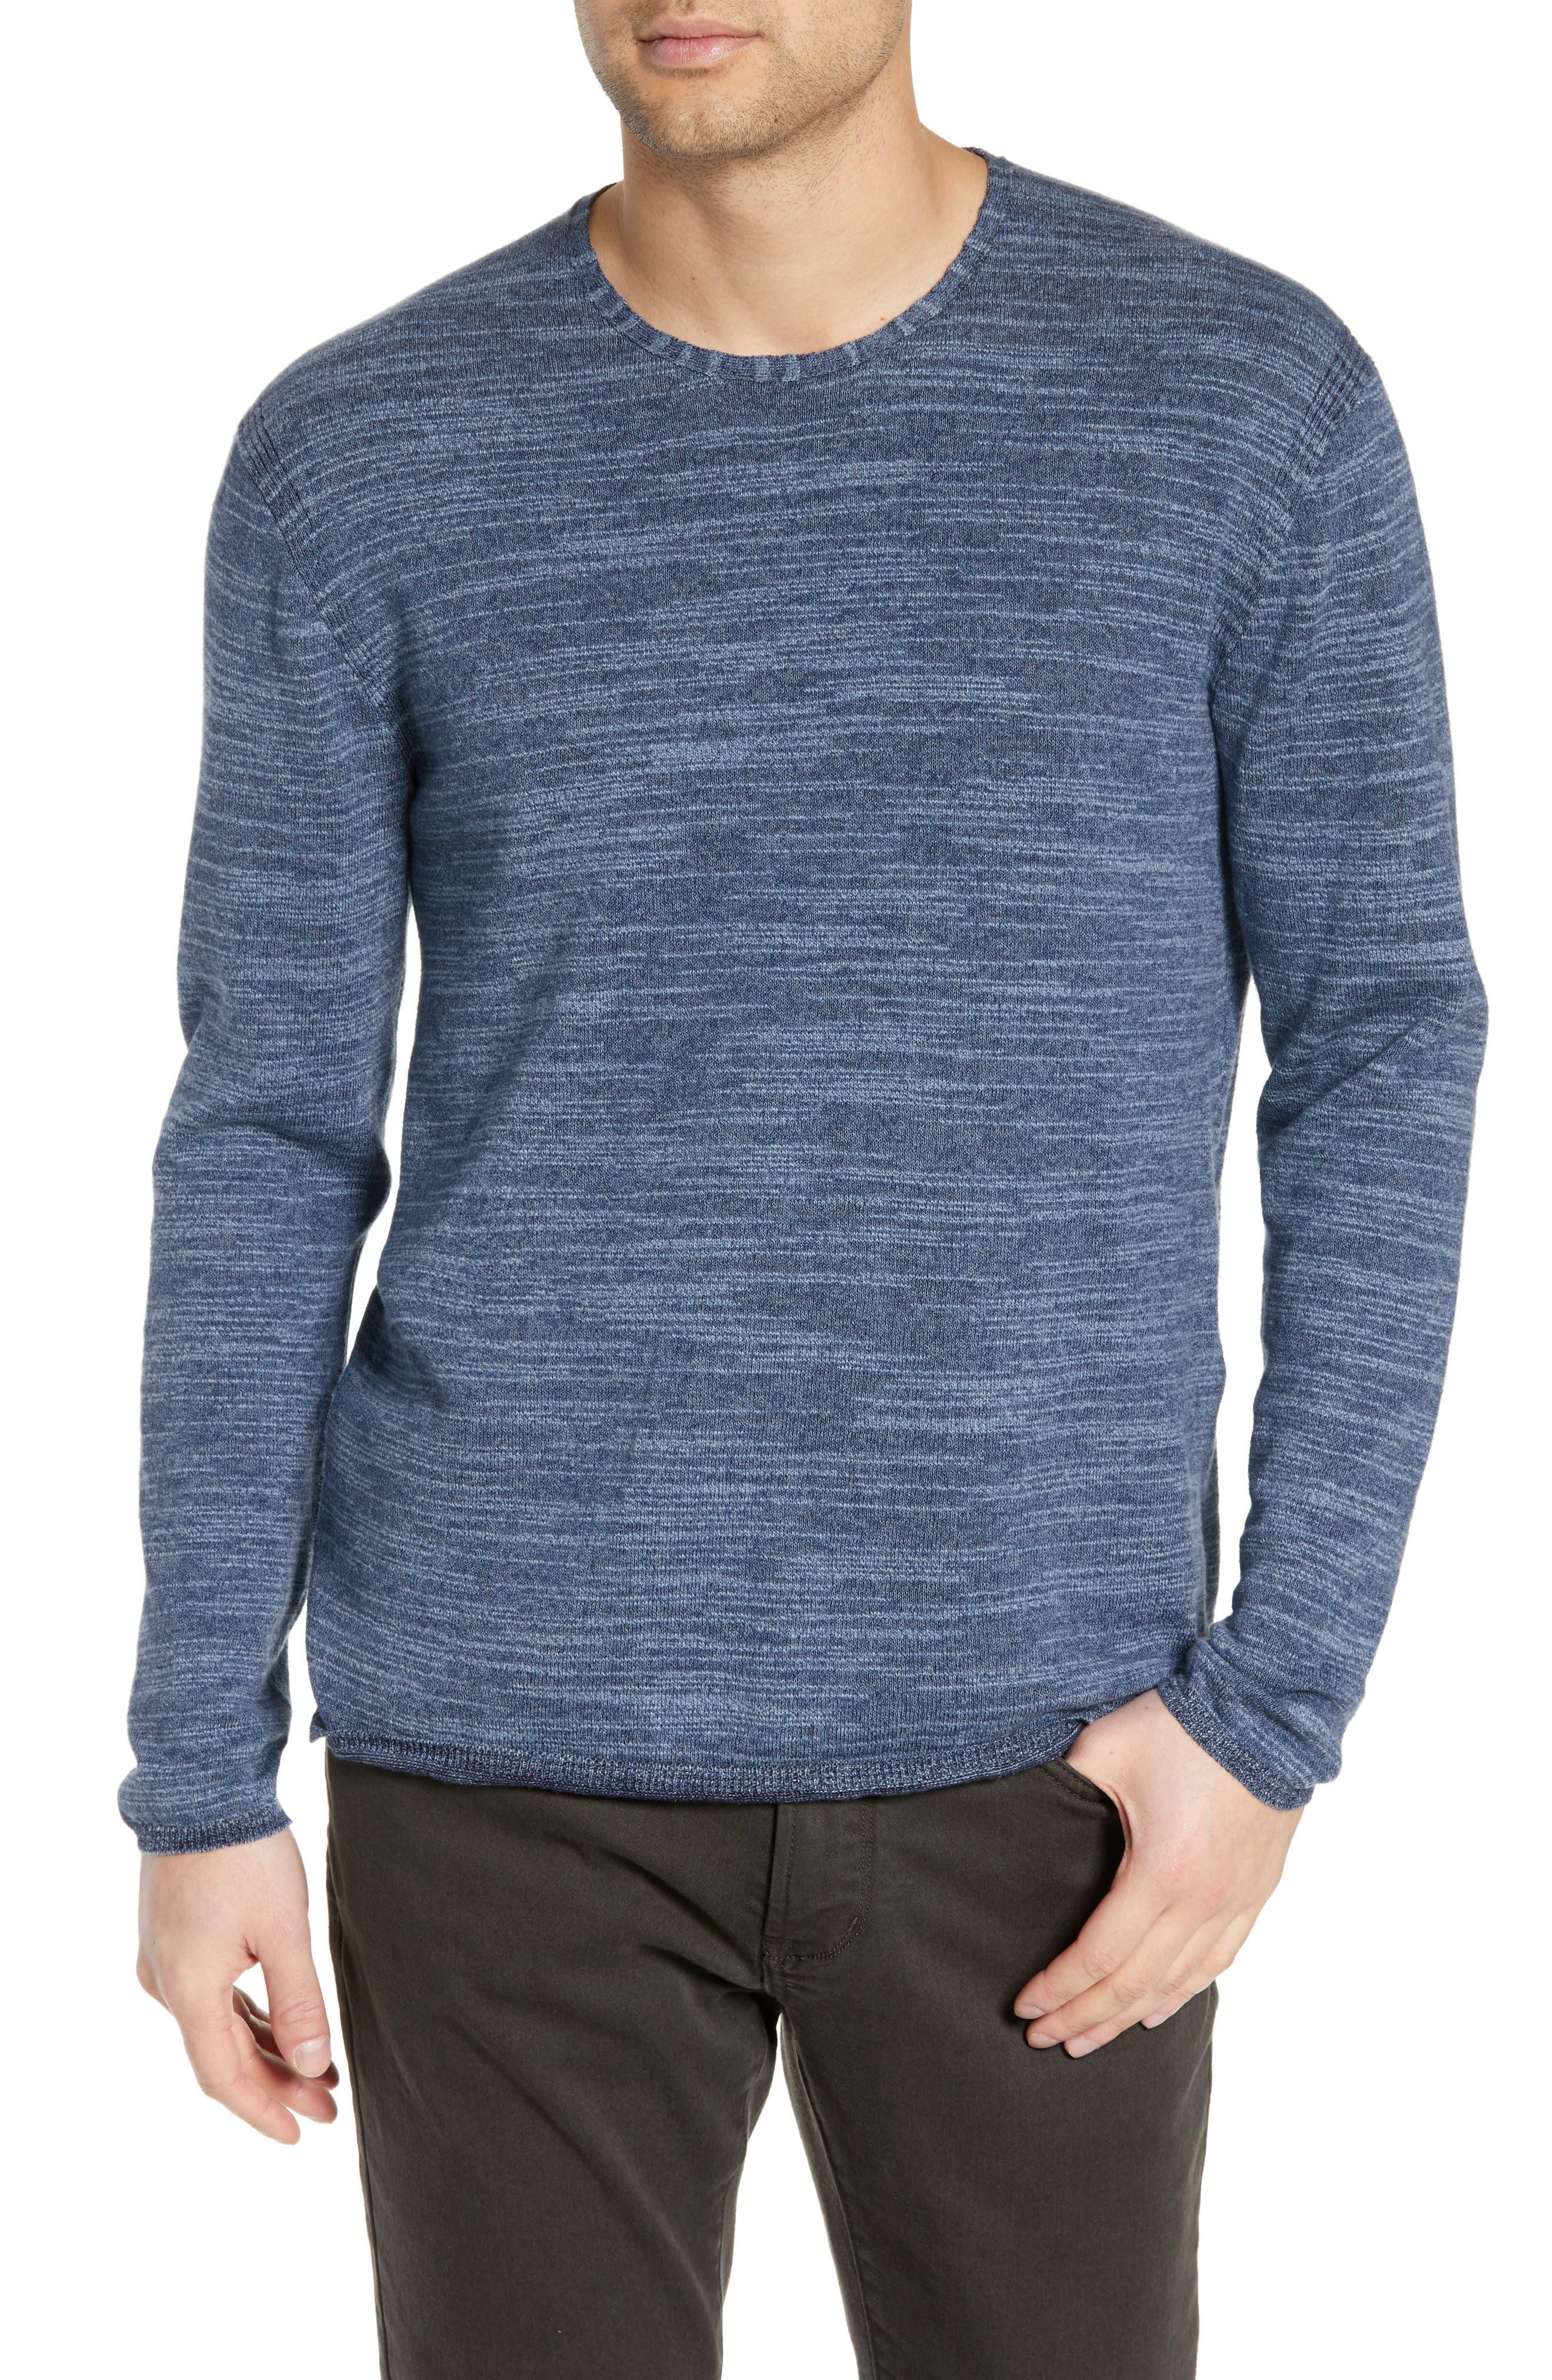 John Varvatos Star Usa Vincent Plated Slim Fit Crewneck Sweater, Blue